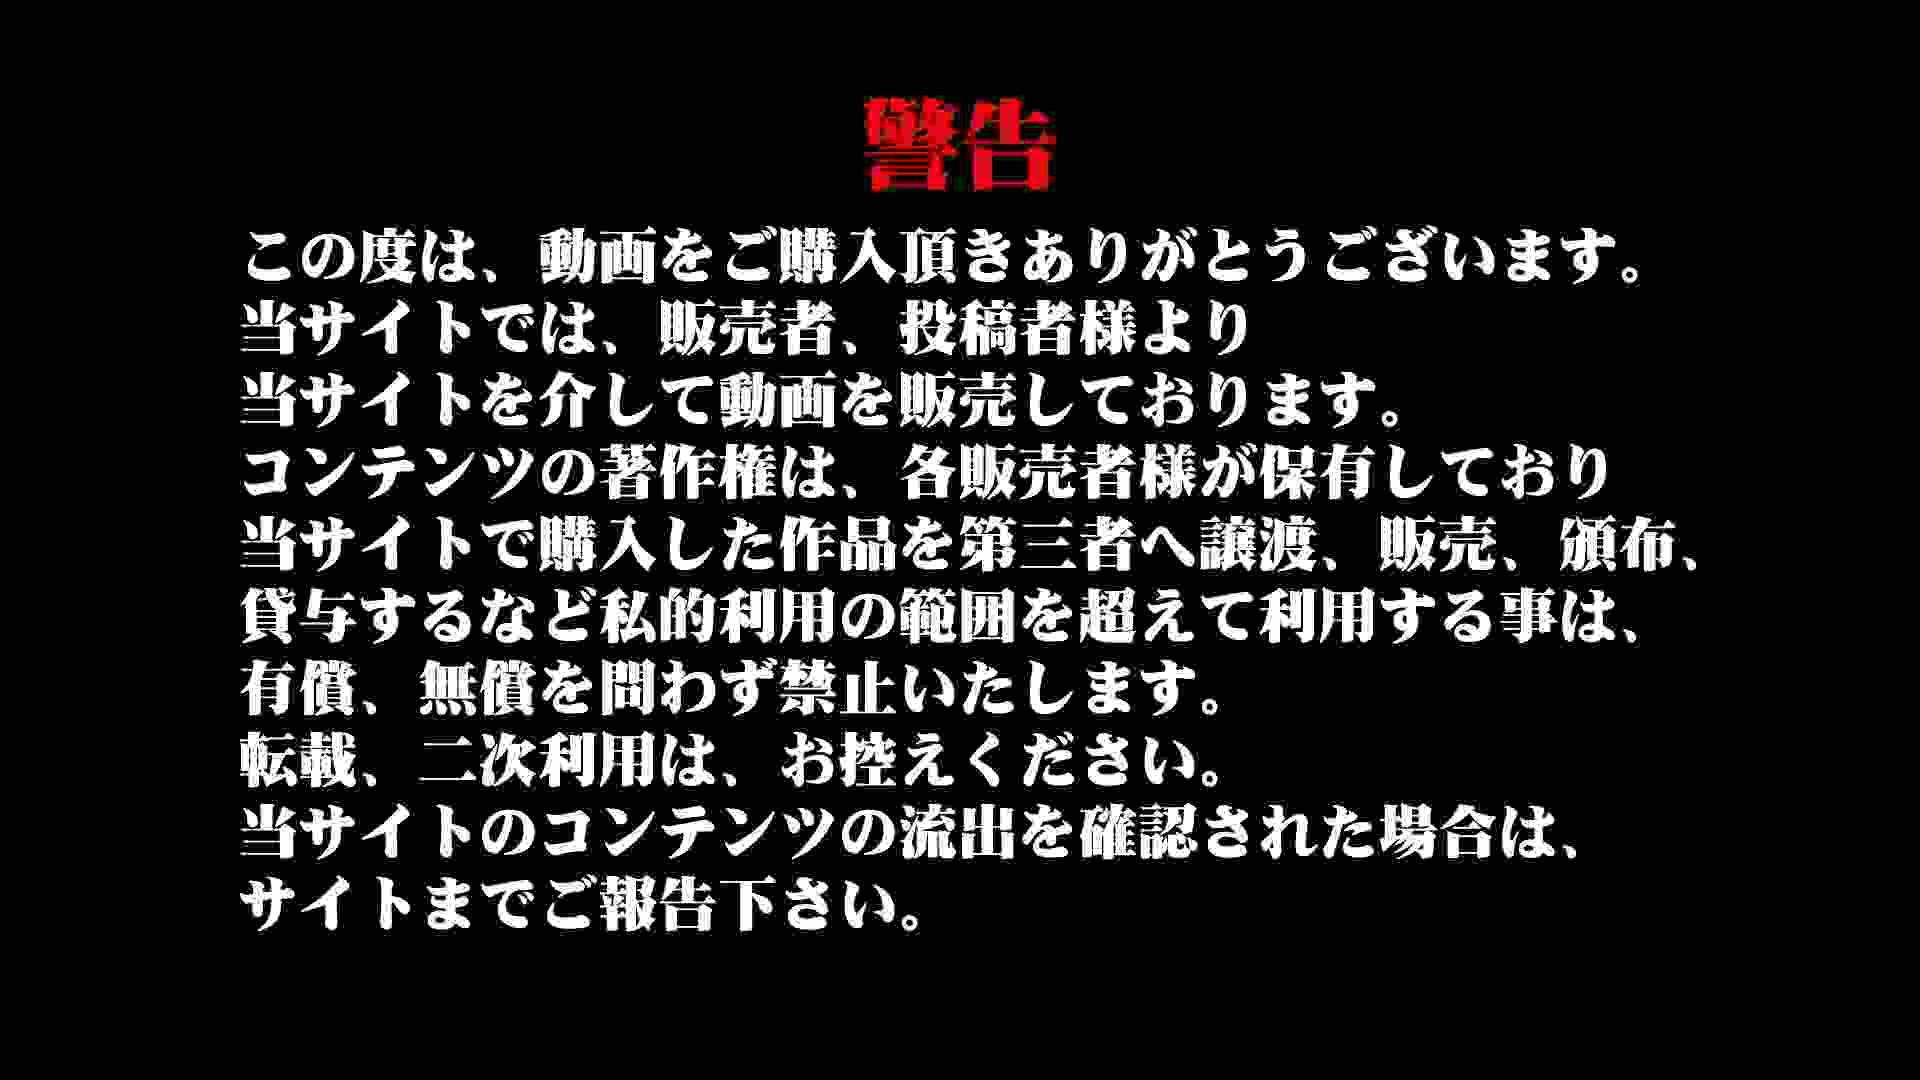 Aquaな露天風呂Vol.963 盗撮シリーズ | 露天風呂編  108PIX 1